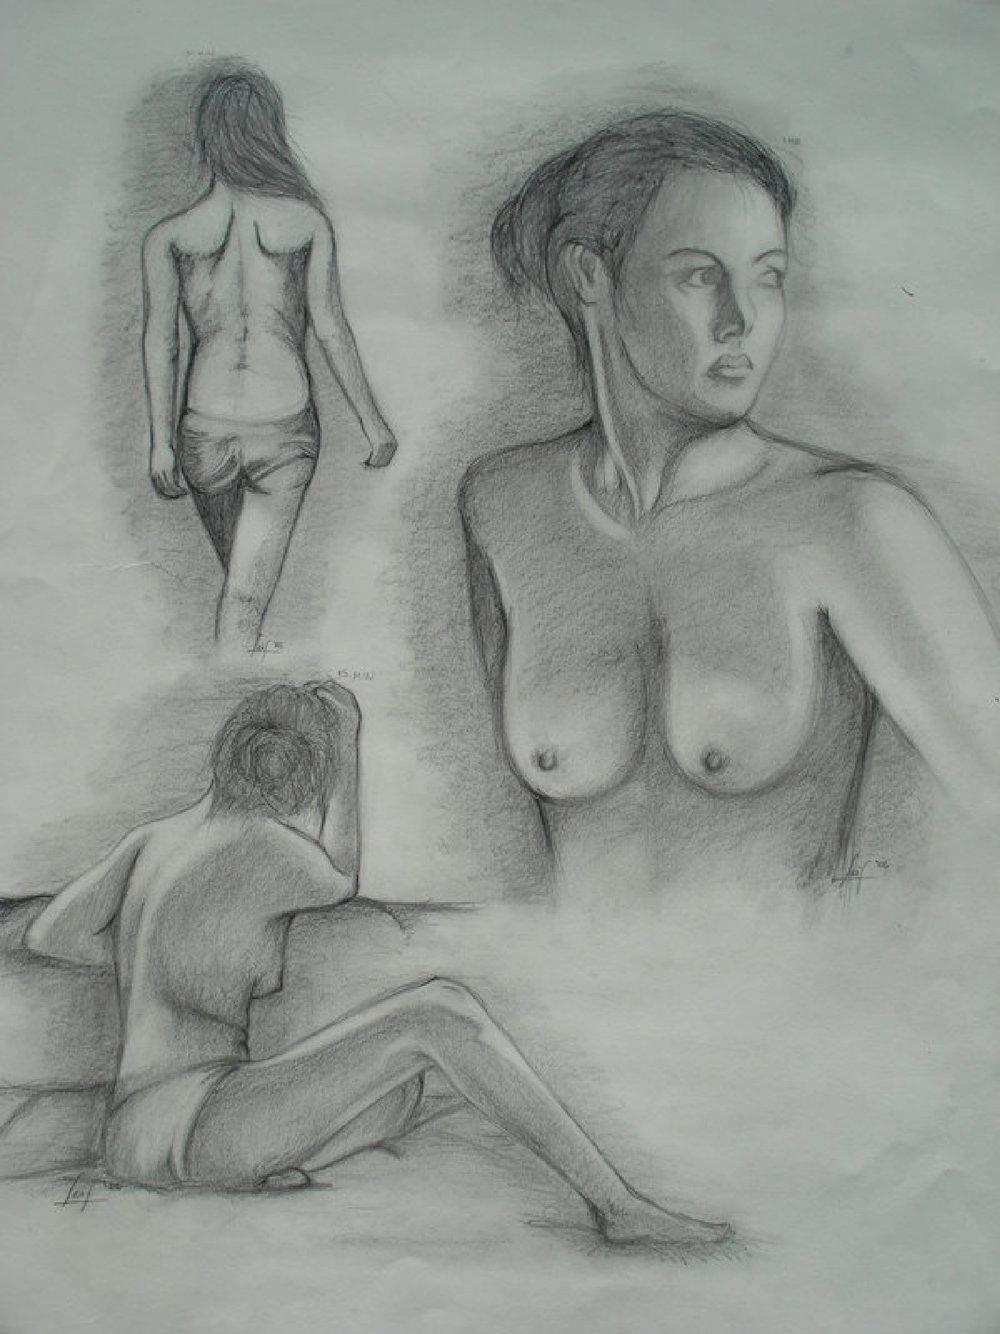 Nudes, graphite, 2006